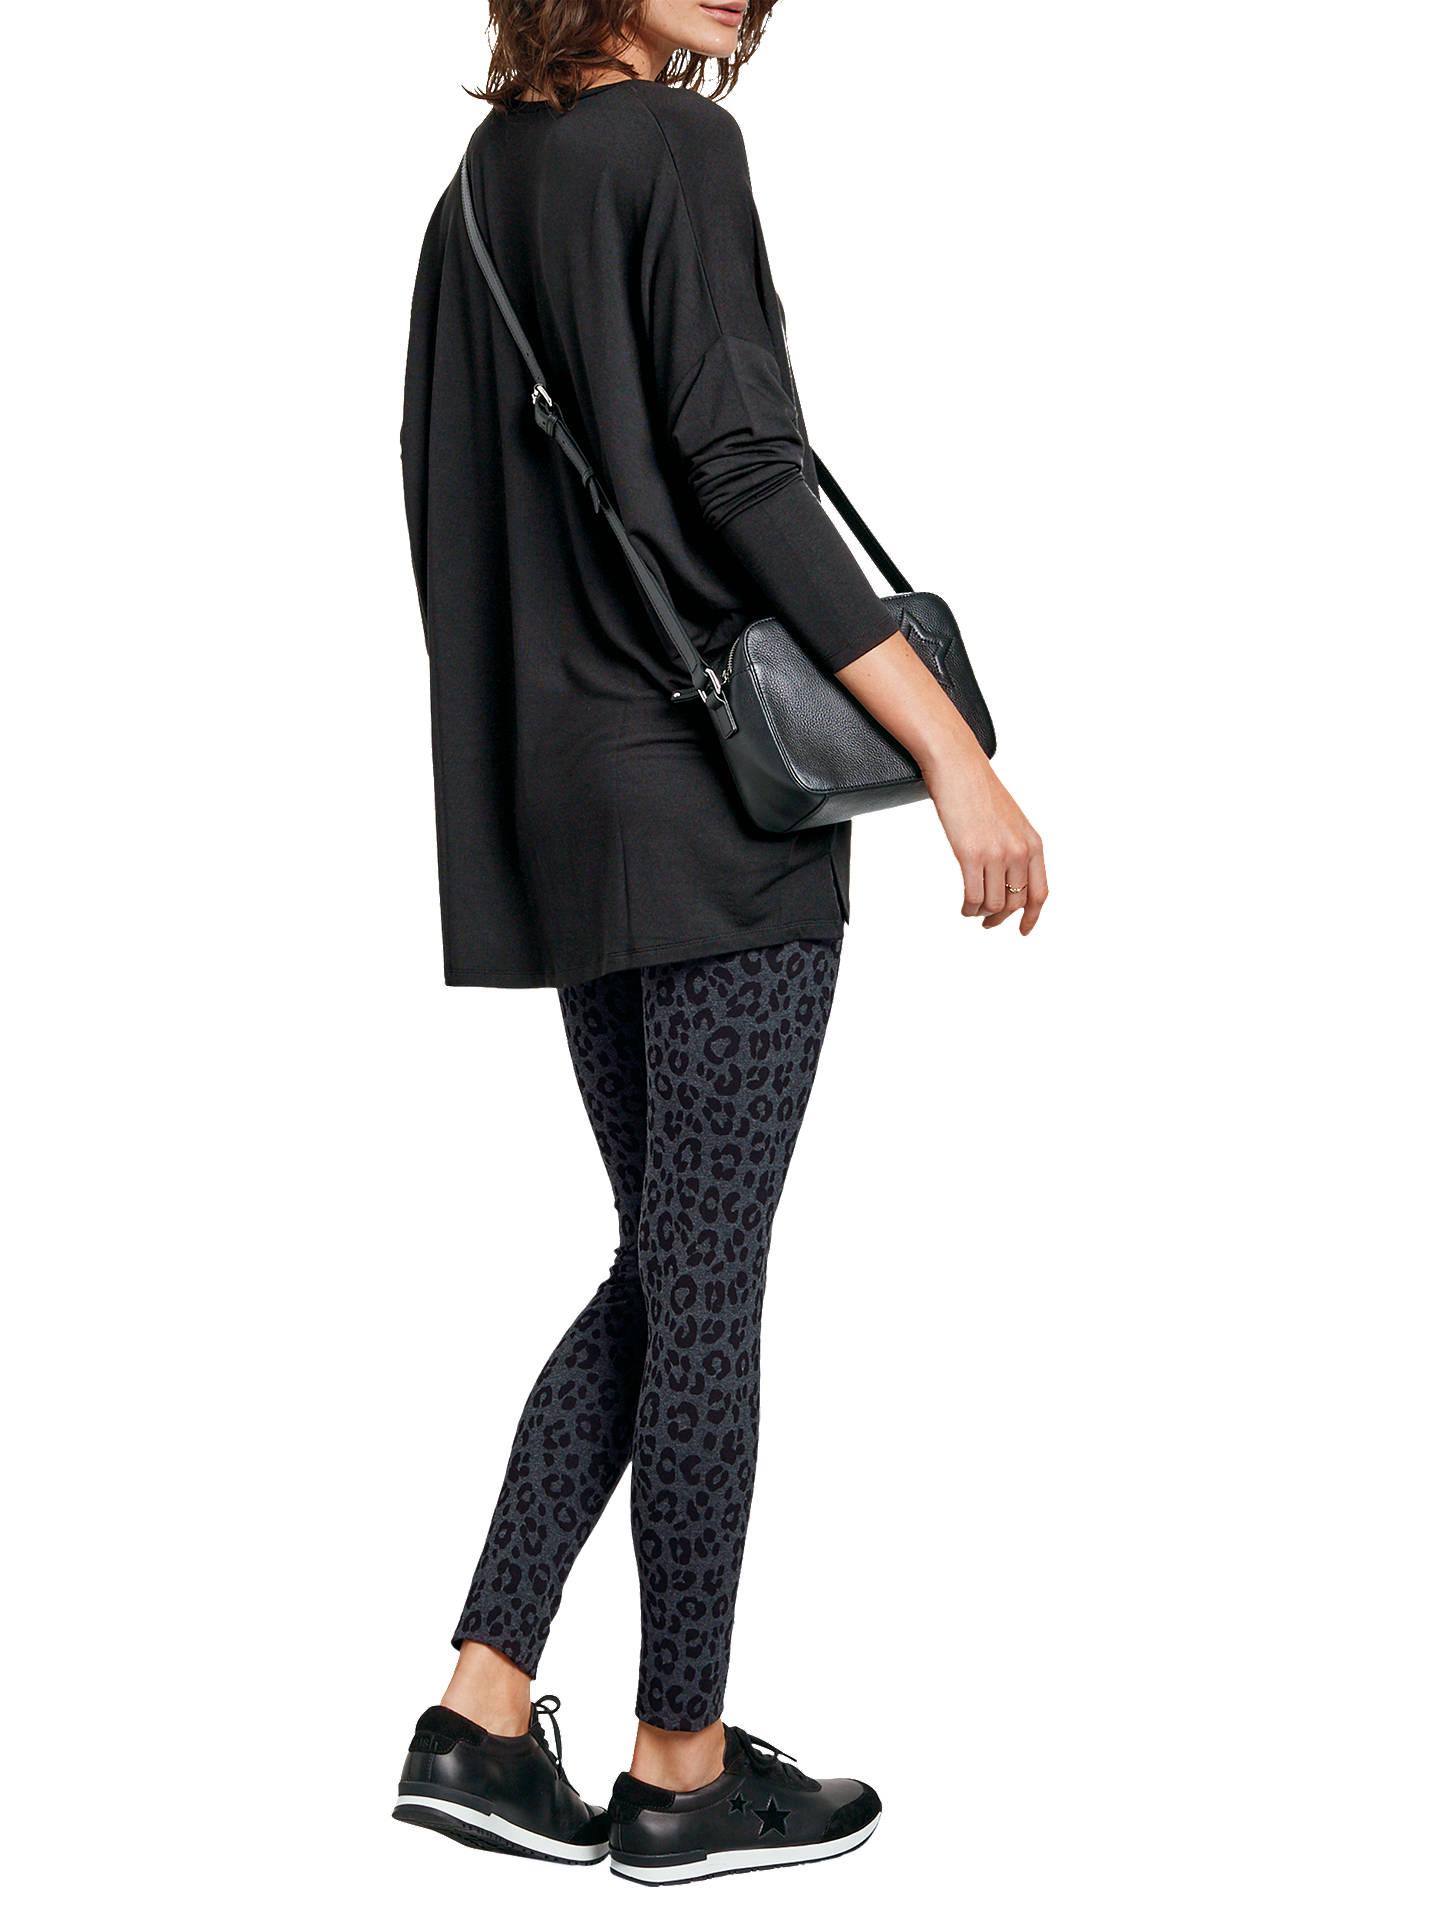 a0bfa8c6c39280 ... Buy hush Leopard Printed Leggings, Black, XS Online at johnlewis.com ...